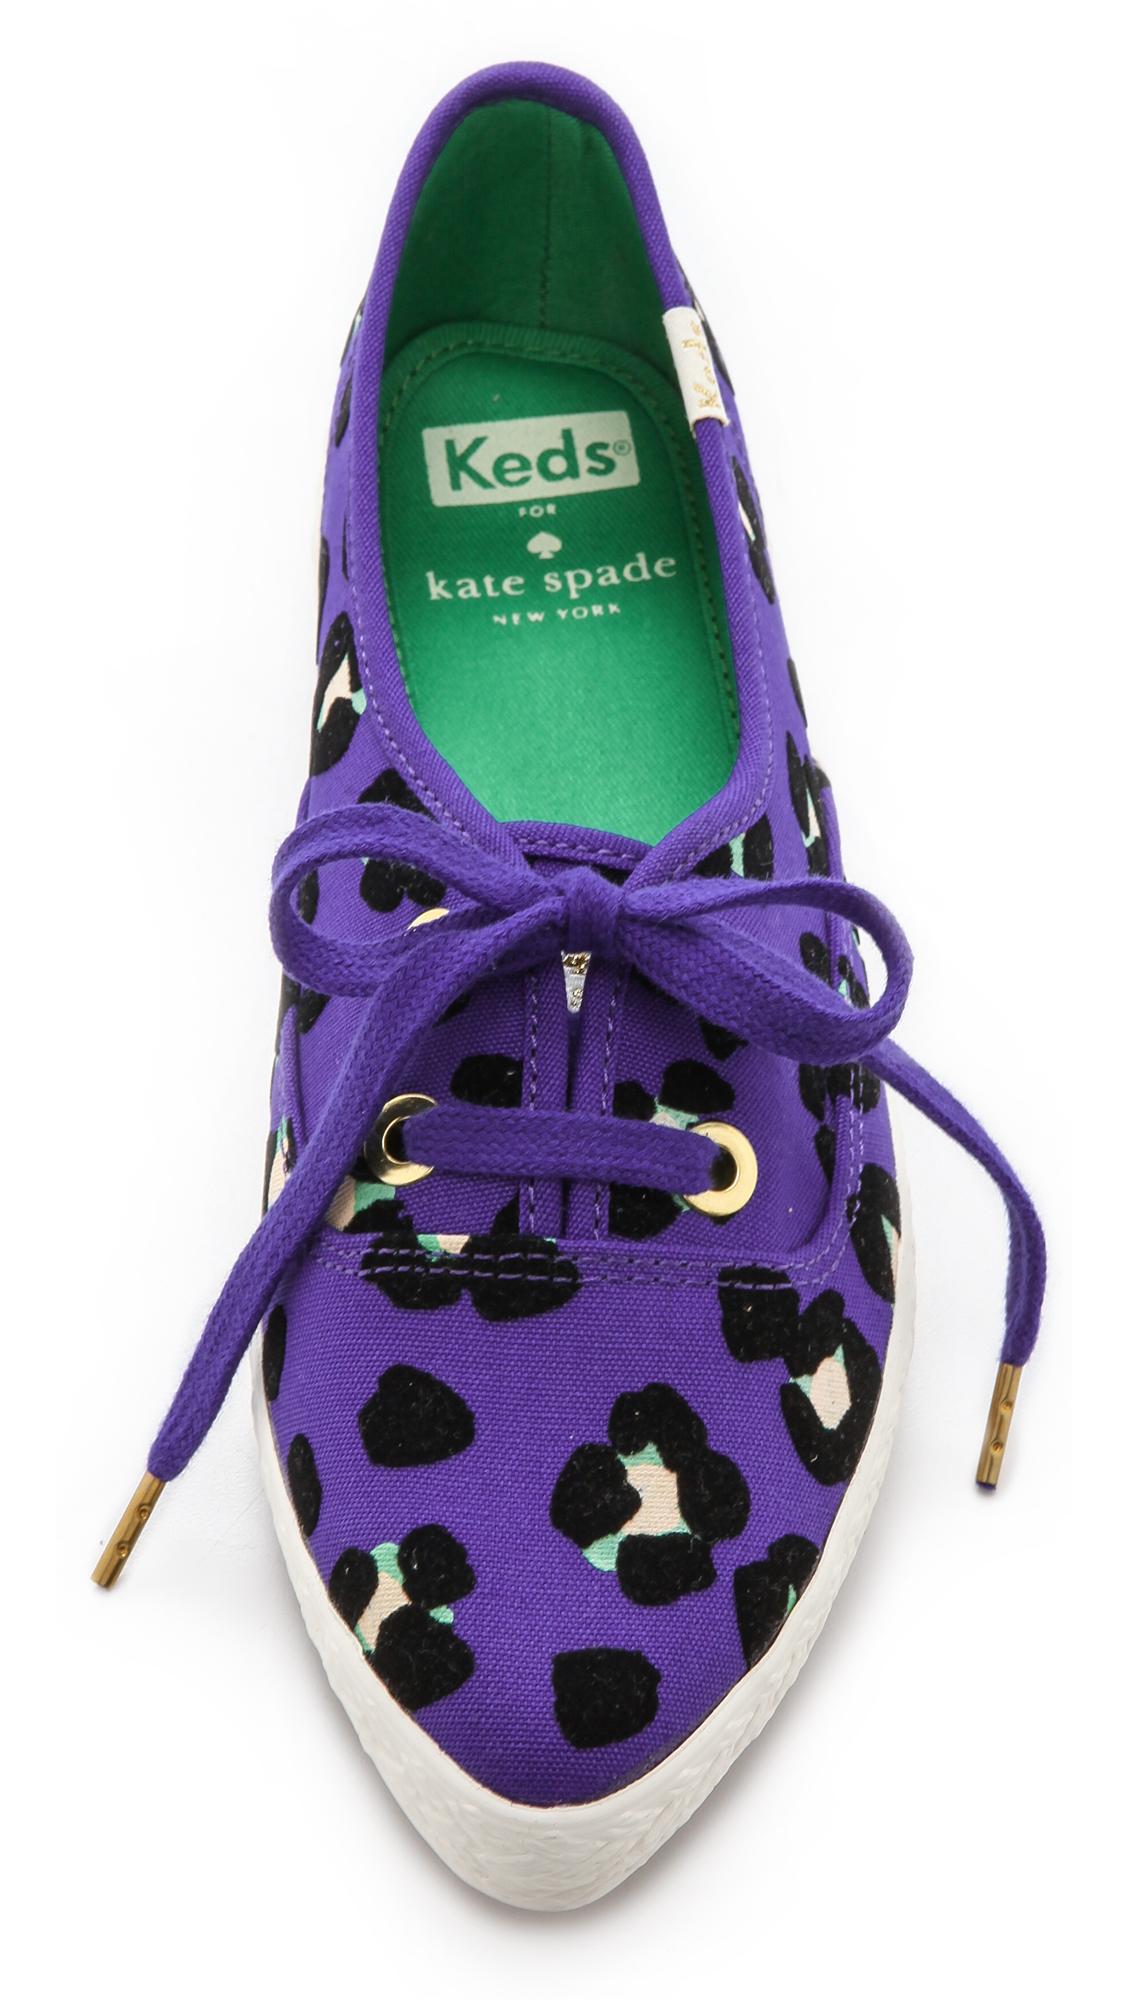 409e71b2c3b9 Kate Spade New York Keds for Kate Spade Pointer Cheetah Sneakers | SHOPBOP